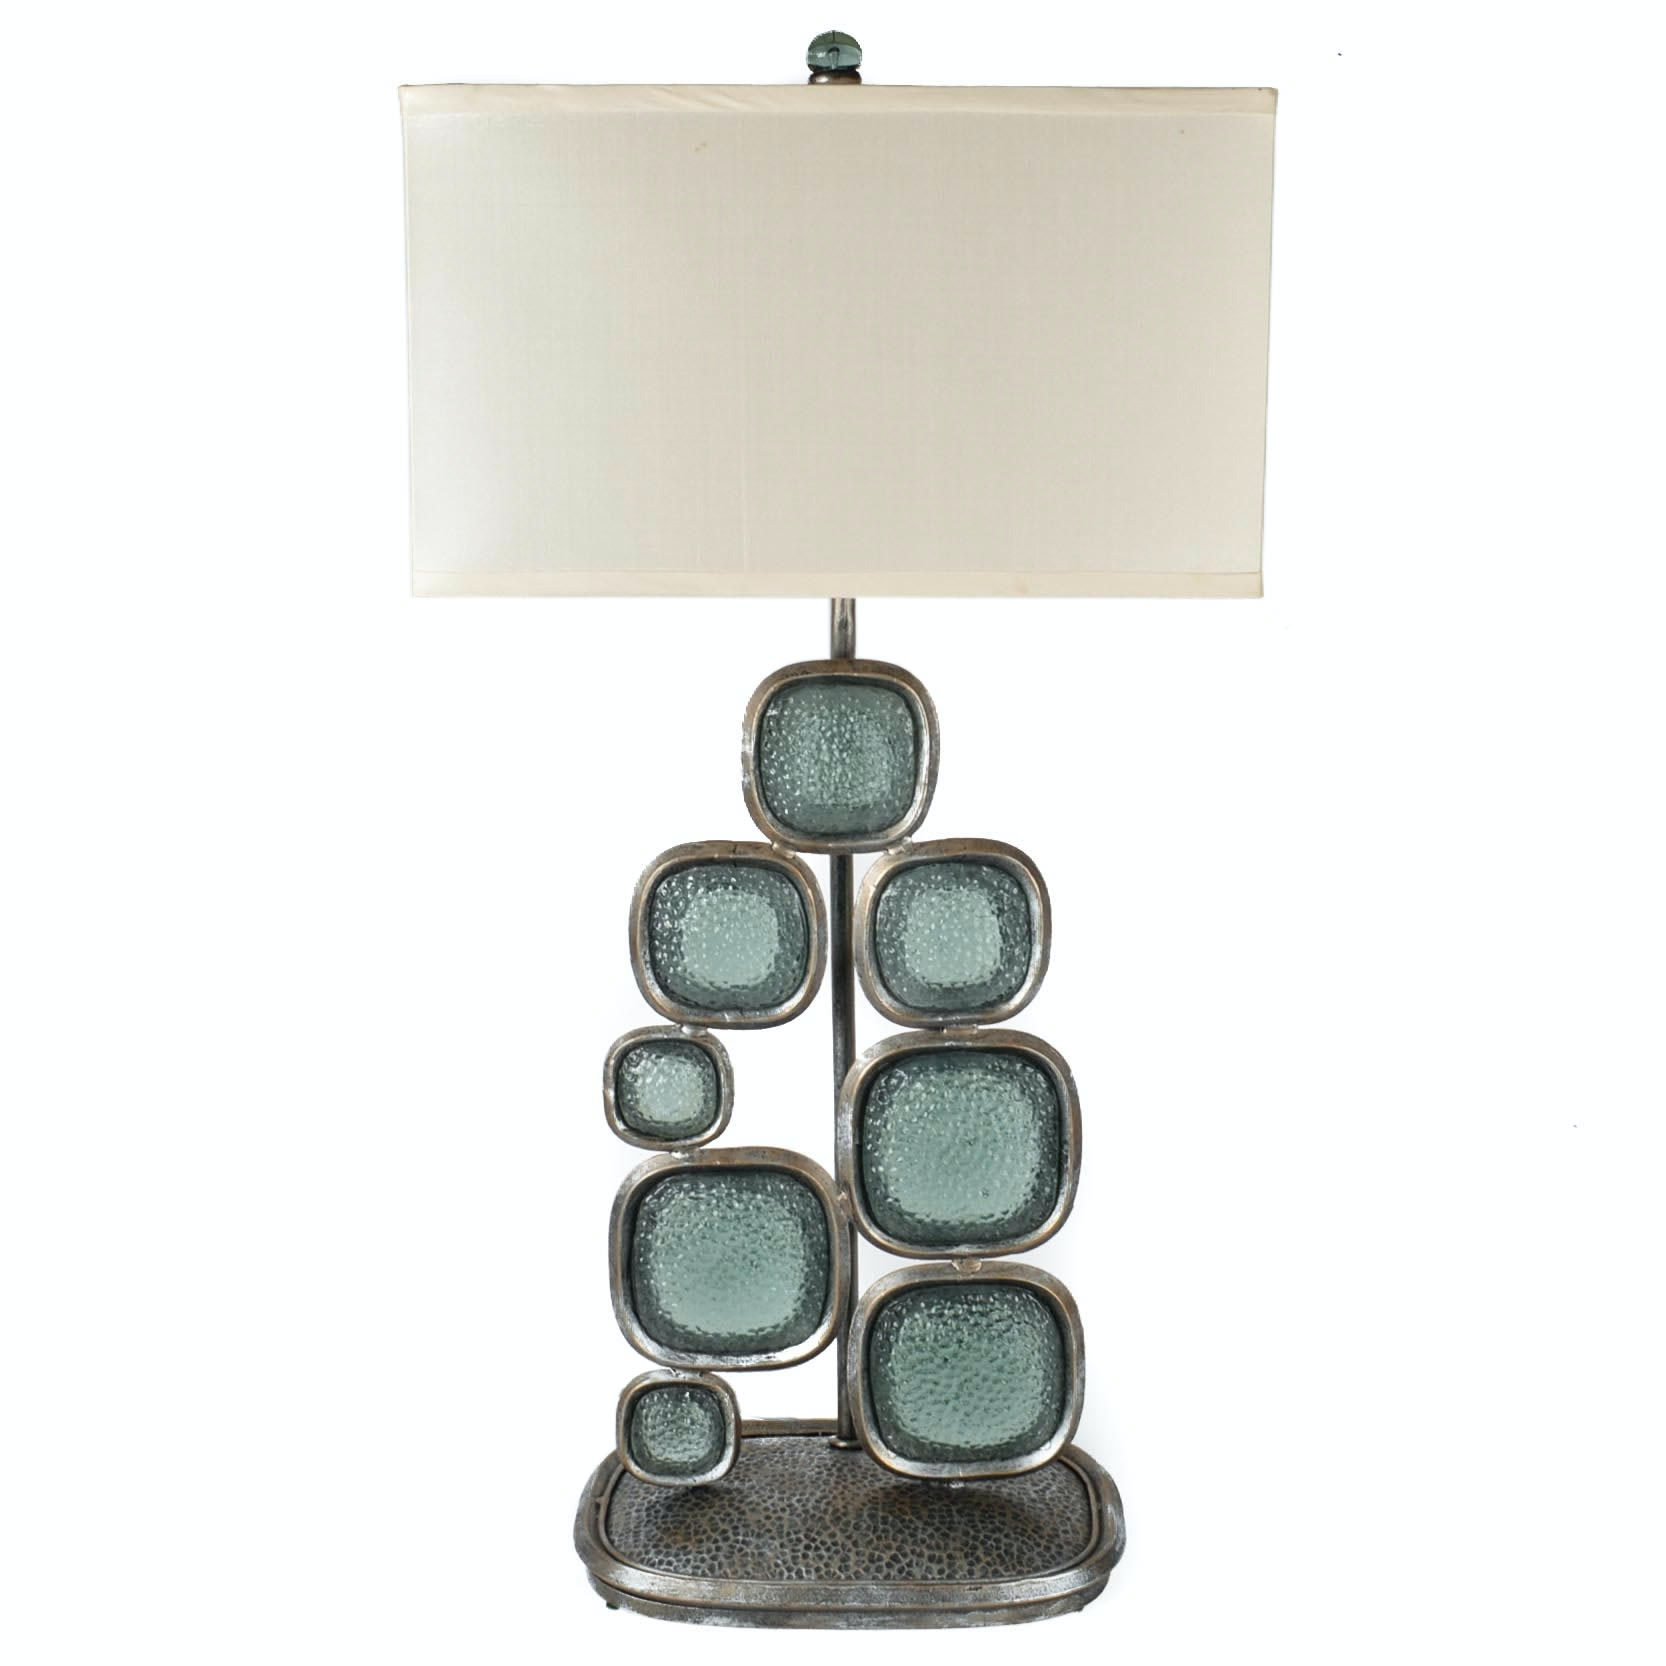 Palecek lighting Woven Pendant Better Homes And Gardens Contemporary Table Lamp By Palecek Ebth